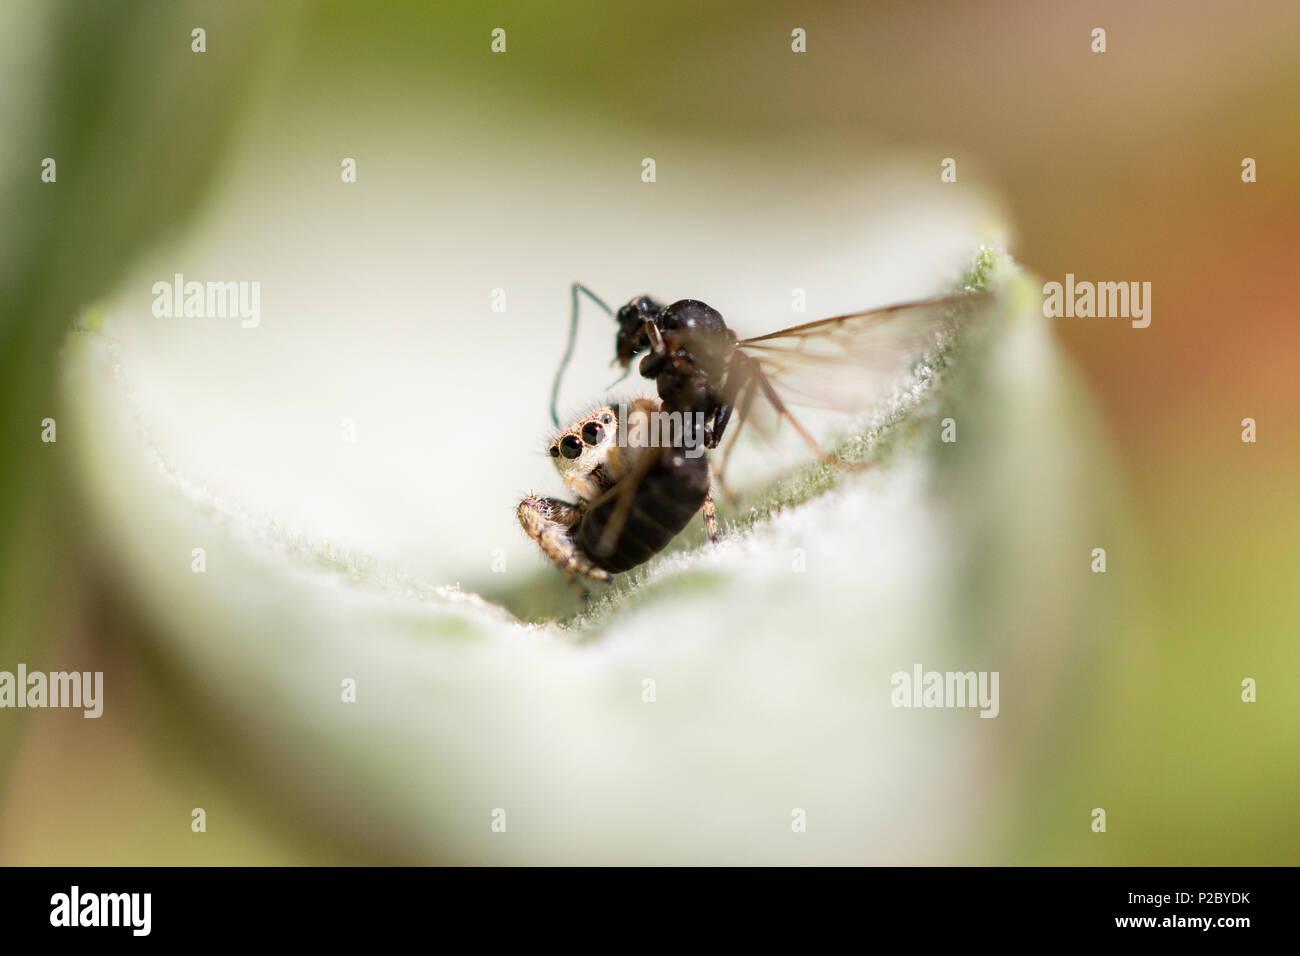 Salticidae spider feeding on a wasp Stock Photo